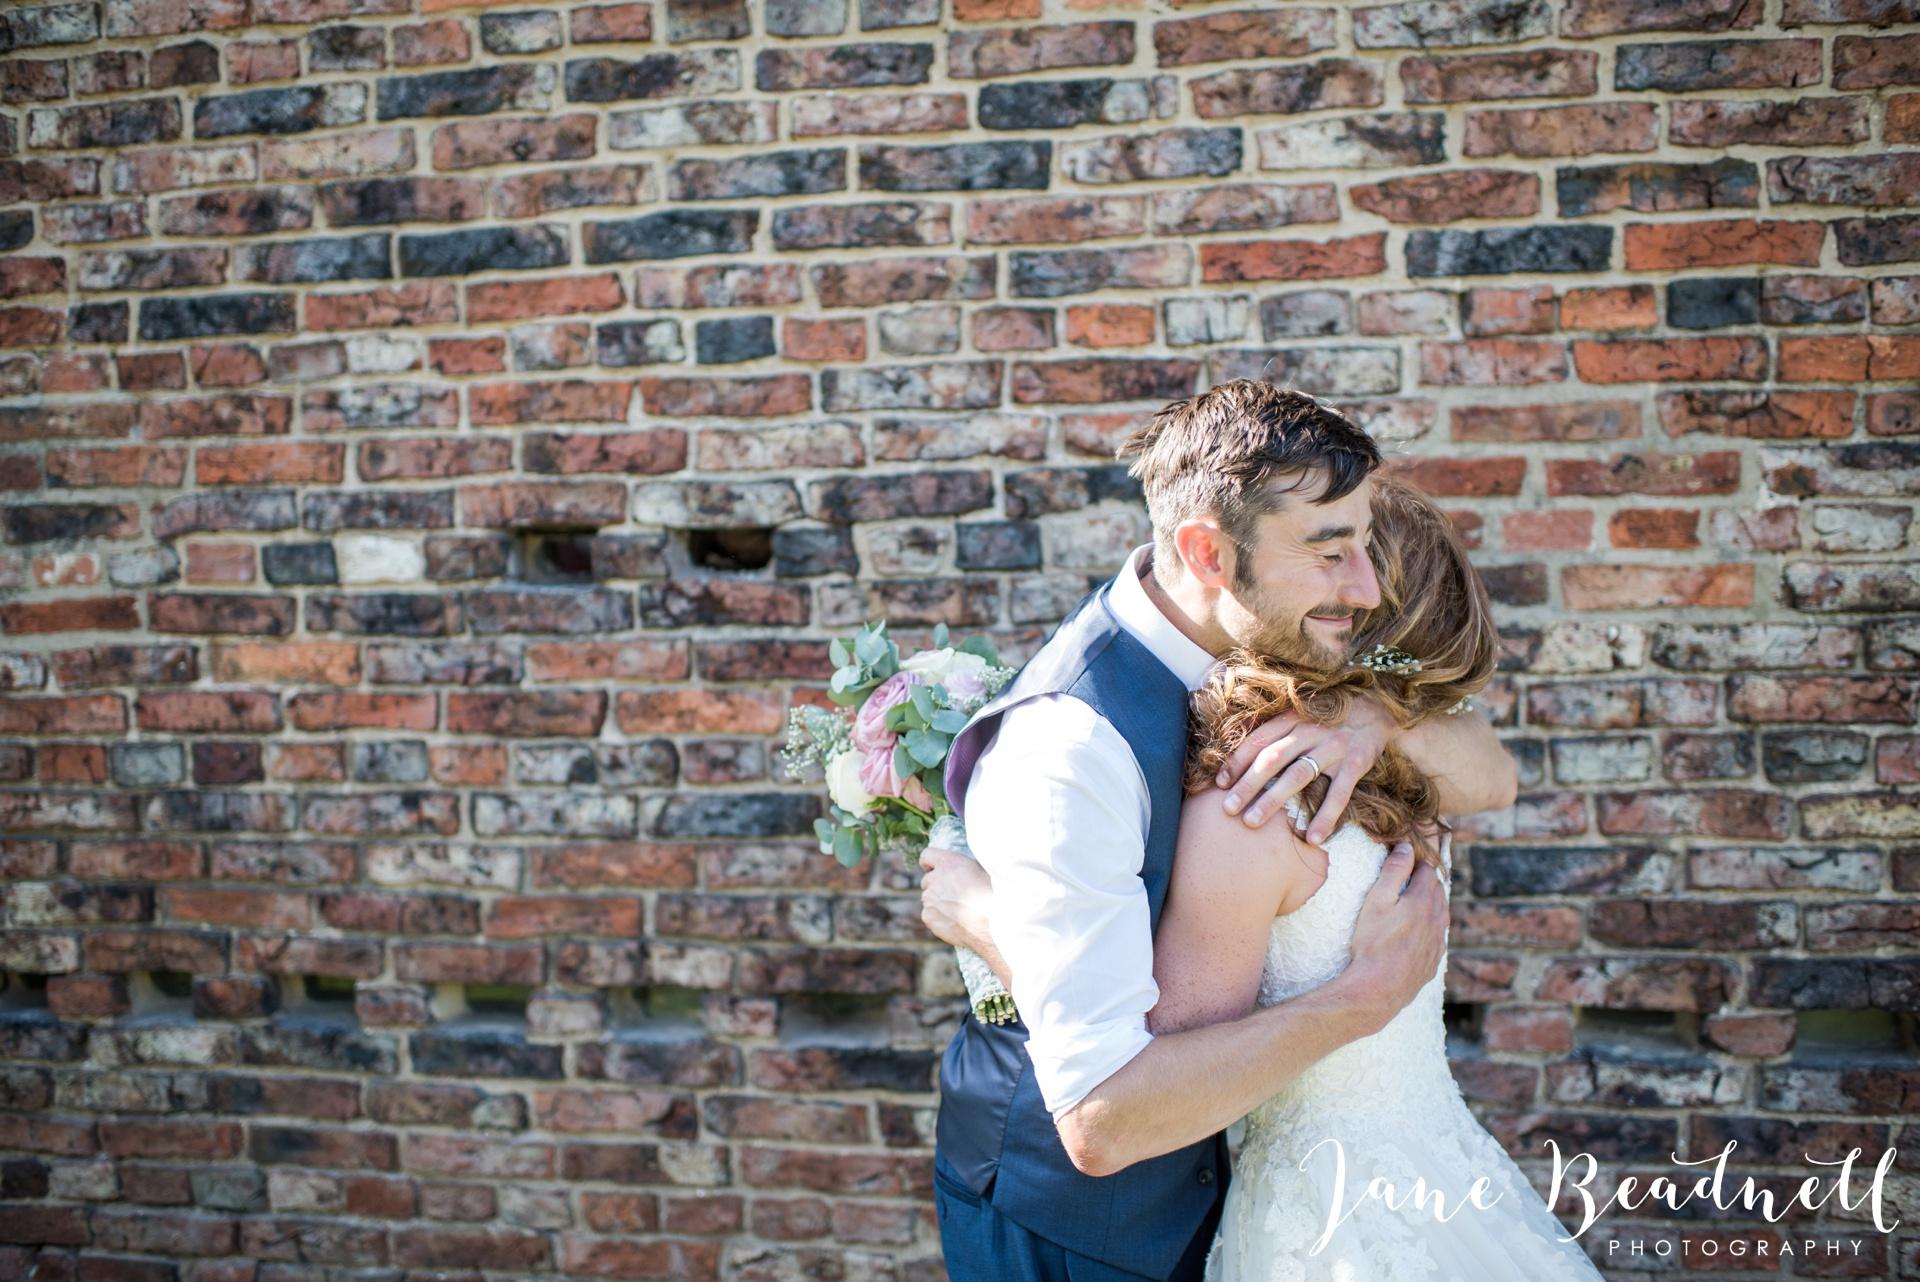 yorkshire-fine-art-wedding-photographer-jane-beadnell-photography-poppleton-york_0114